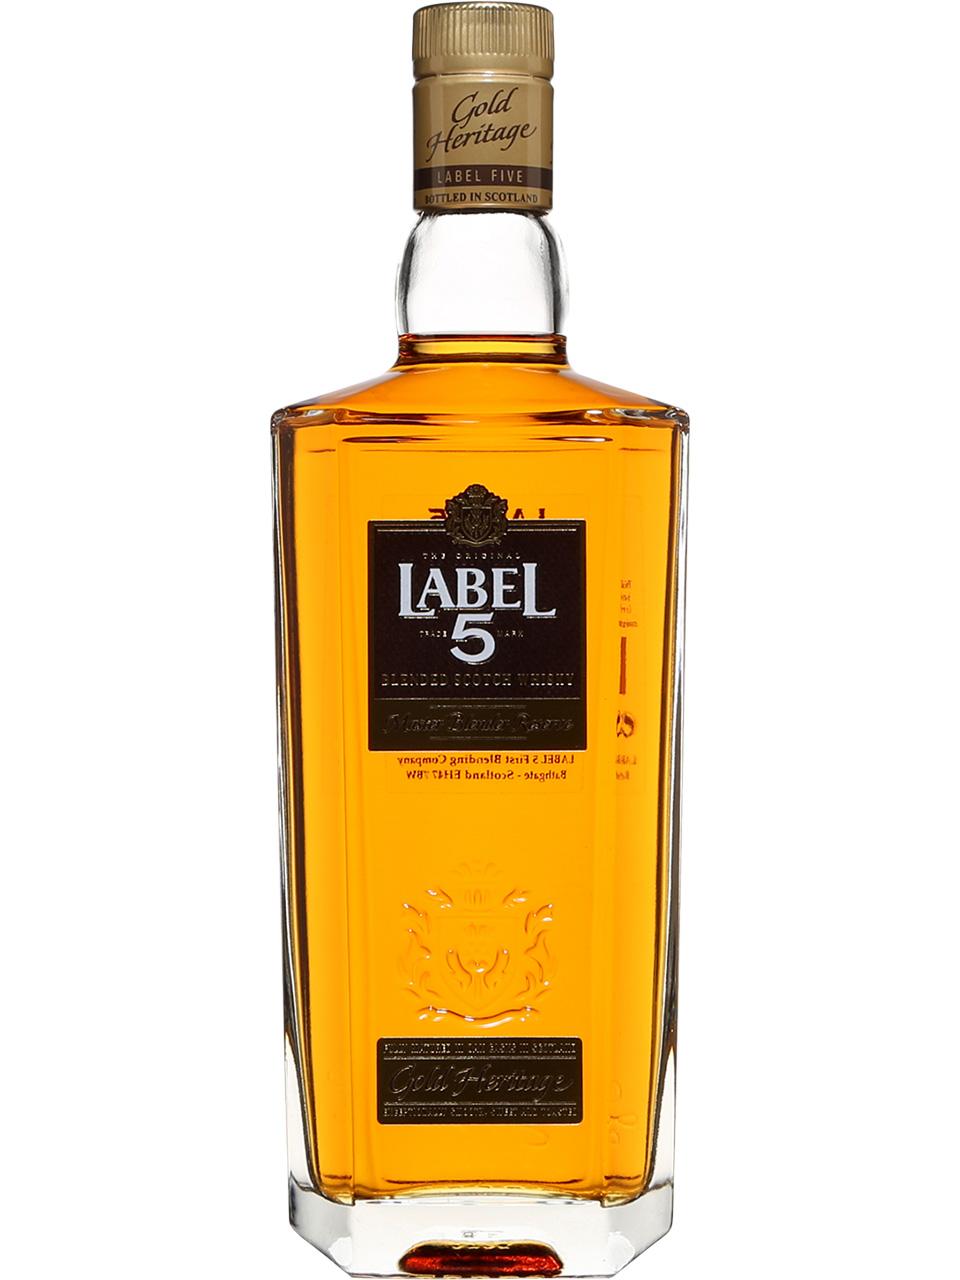 Label 5 Gold Heritage Scotch Whisky